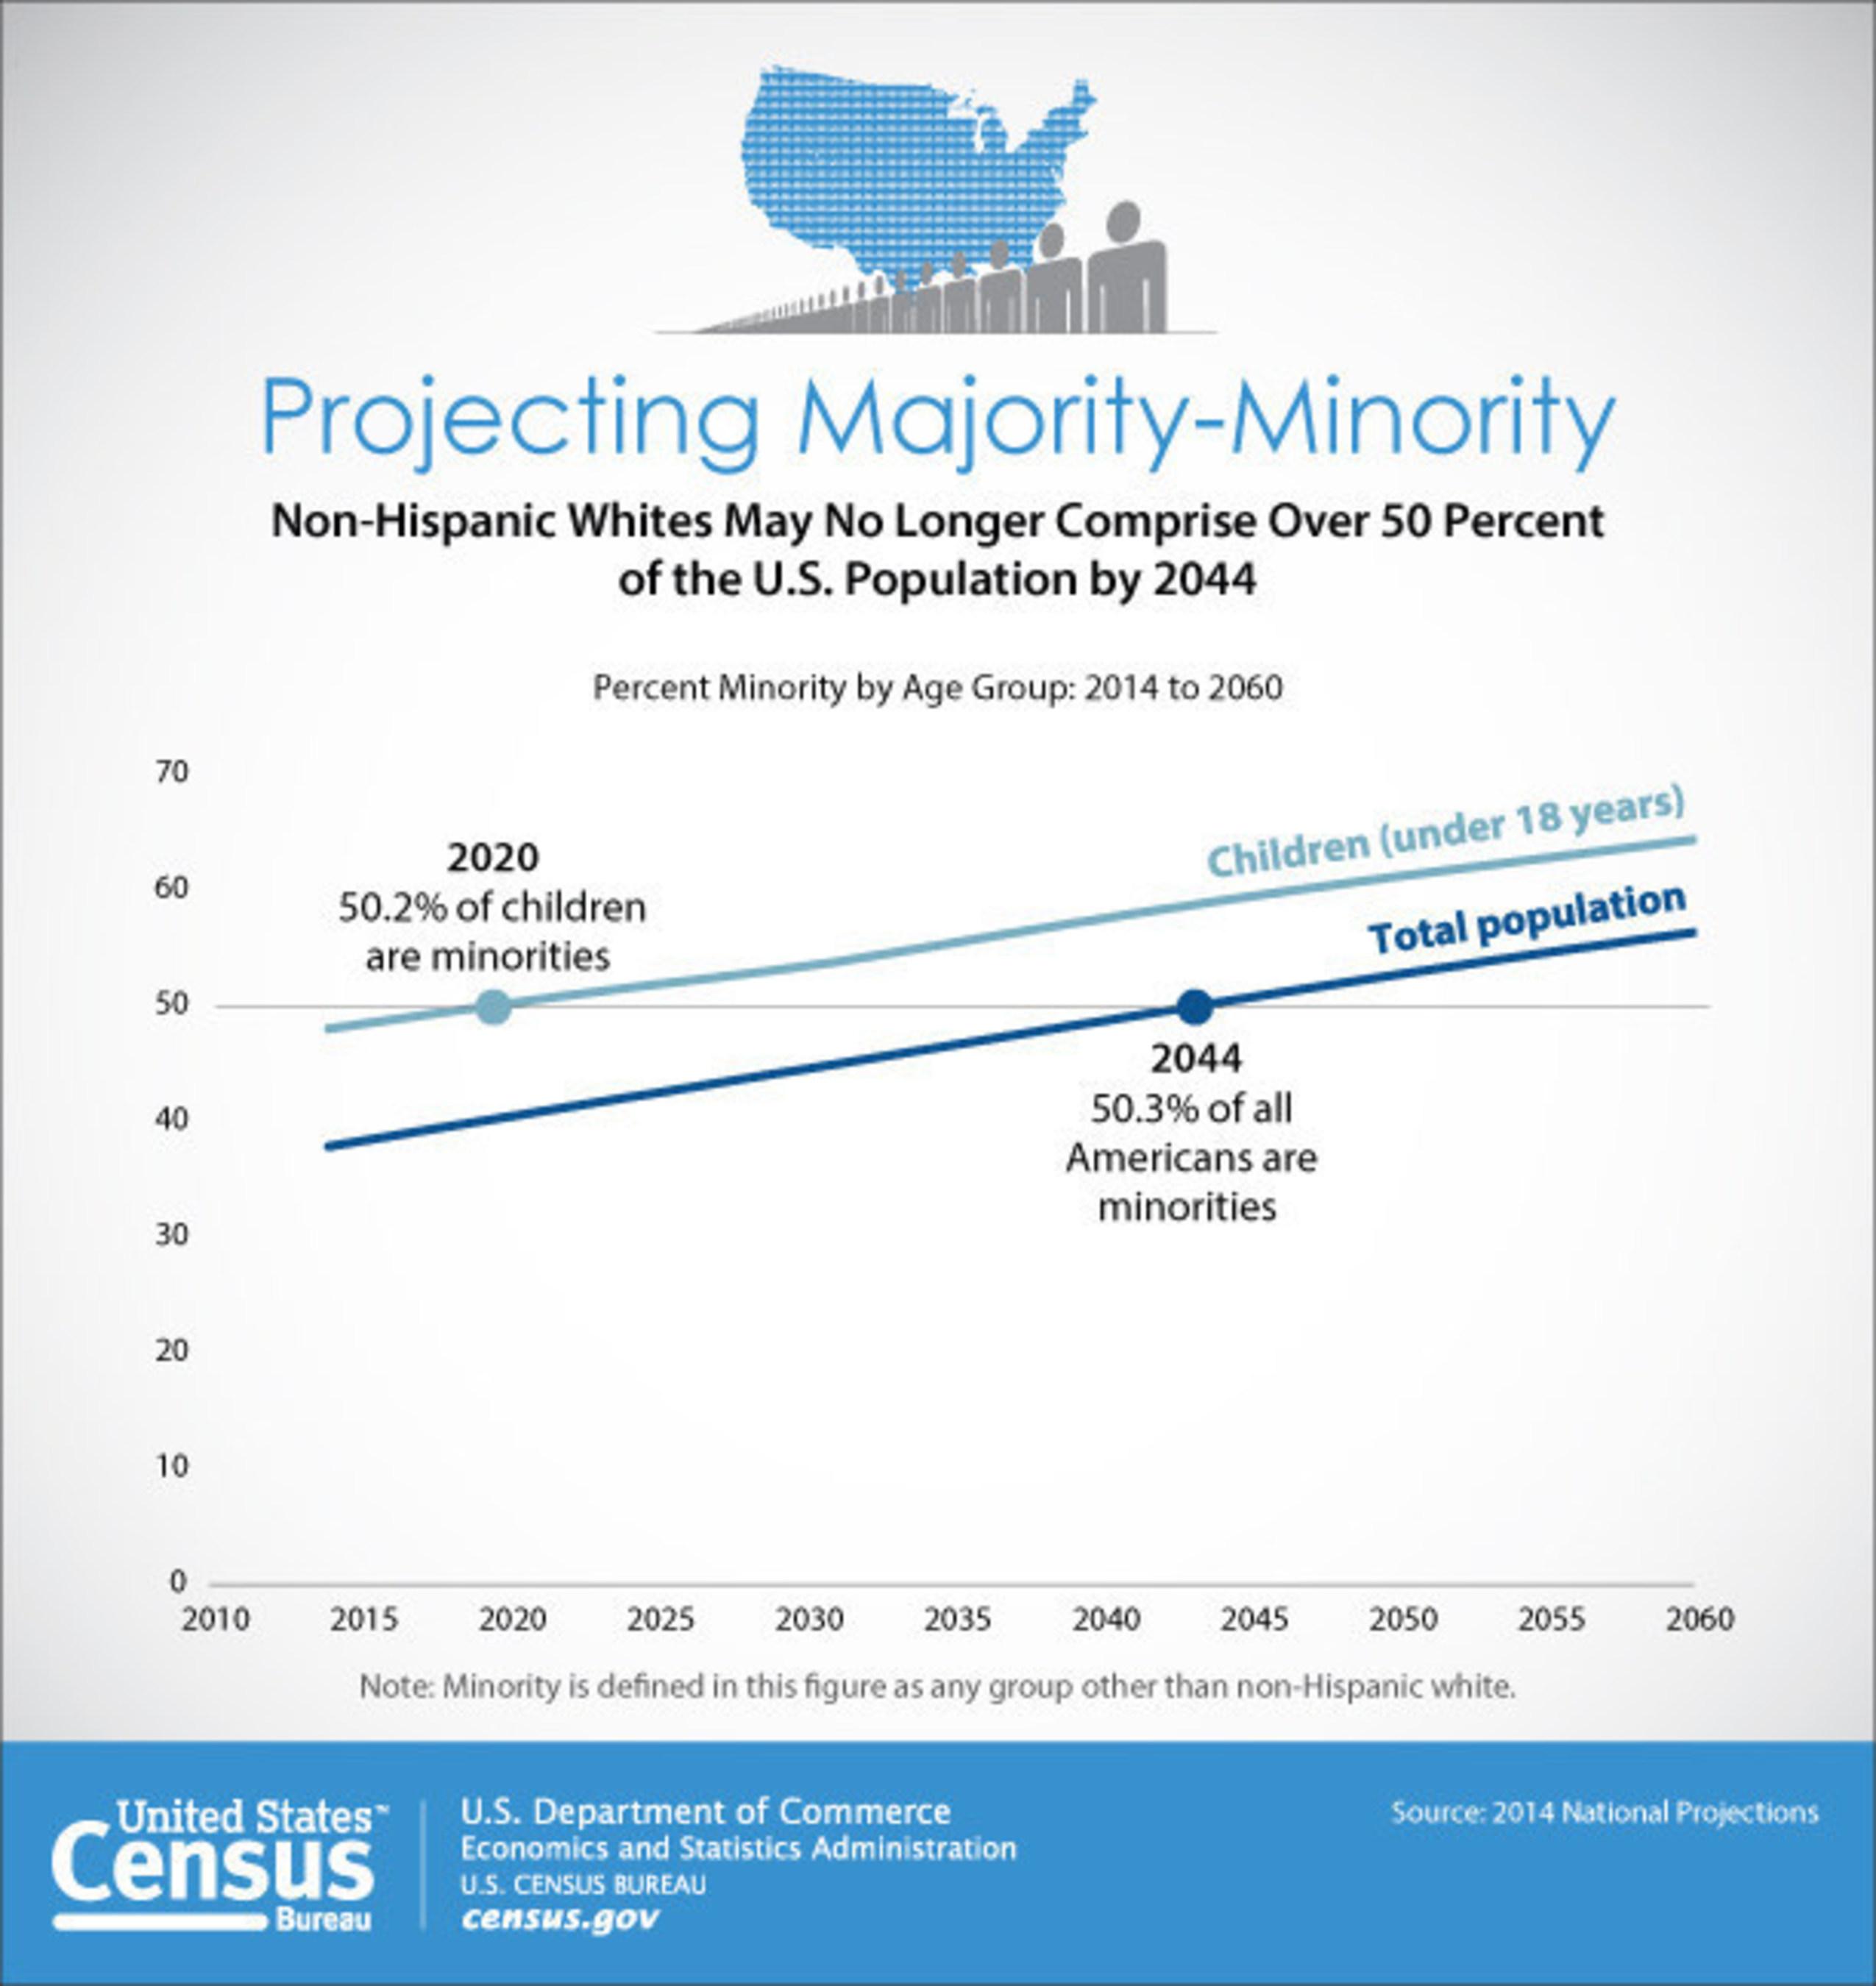 new census bureau report analyzes u s population projections washington march 3 2015. Black Bedroom Furniture Sets. Home Design Ideas